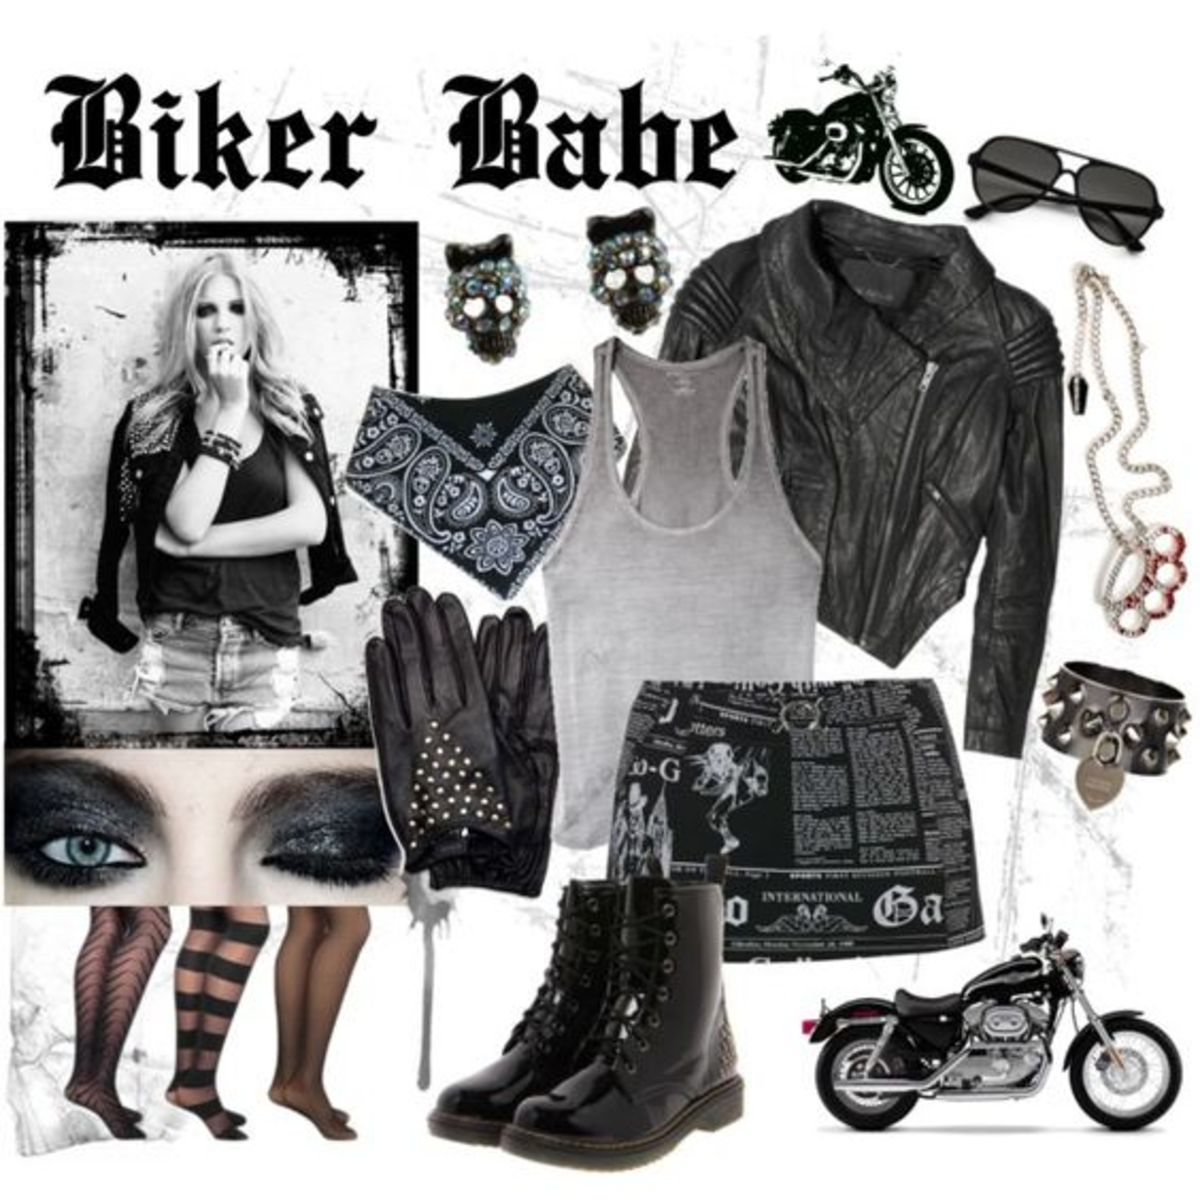 biker-chick-costume